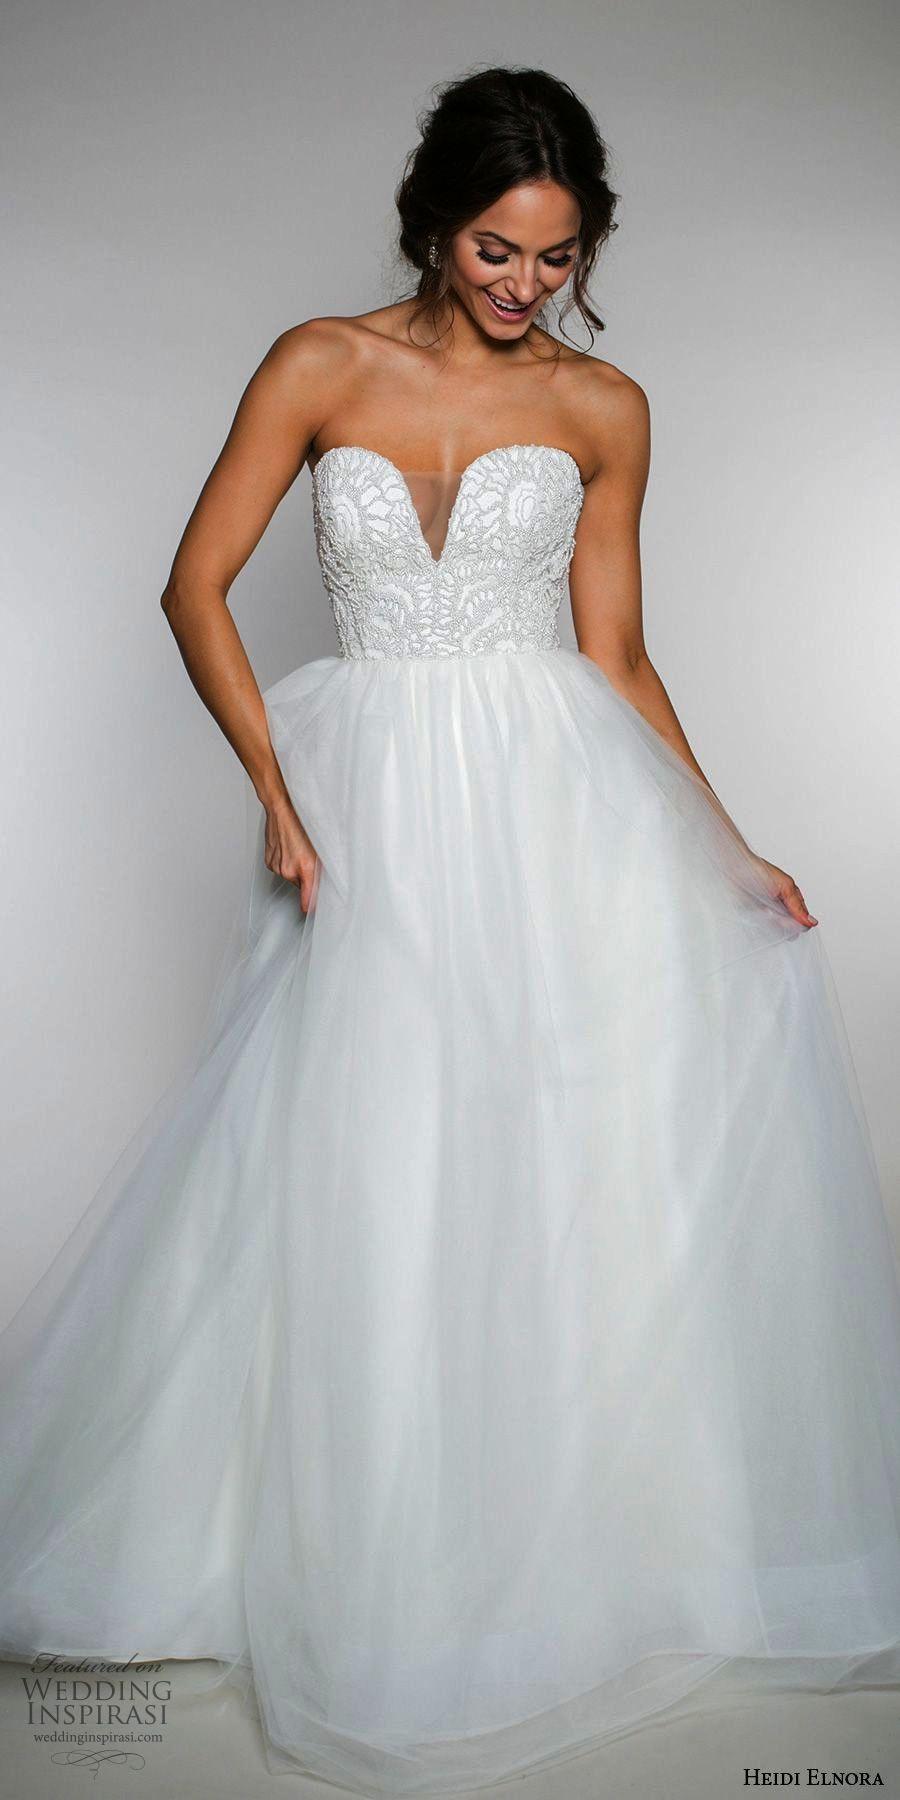 Check it out - Lace Wedding Dresses Under 1000 ;D | Lace Wedding ...